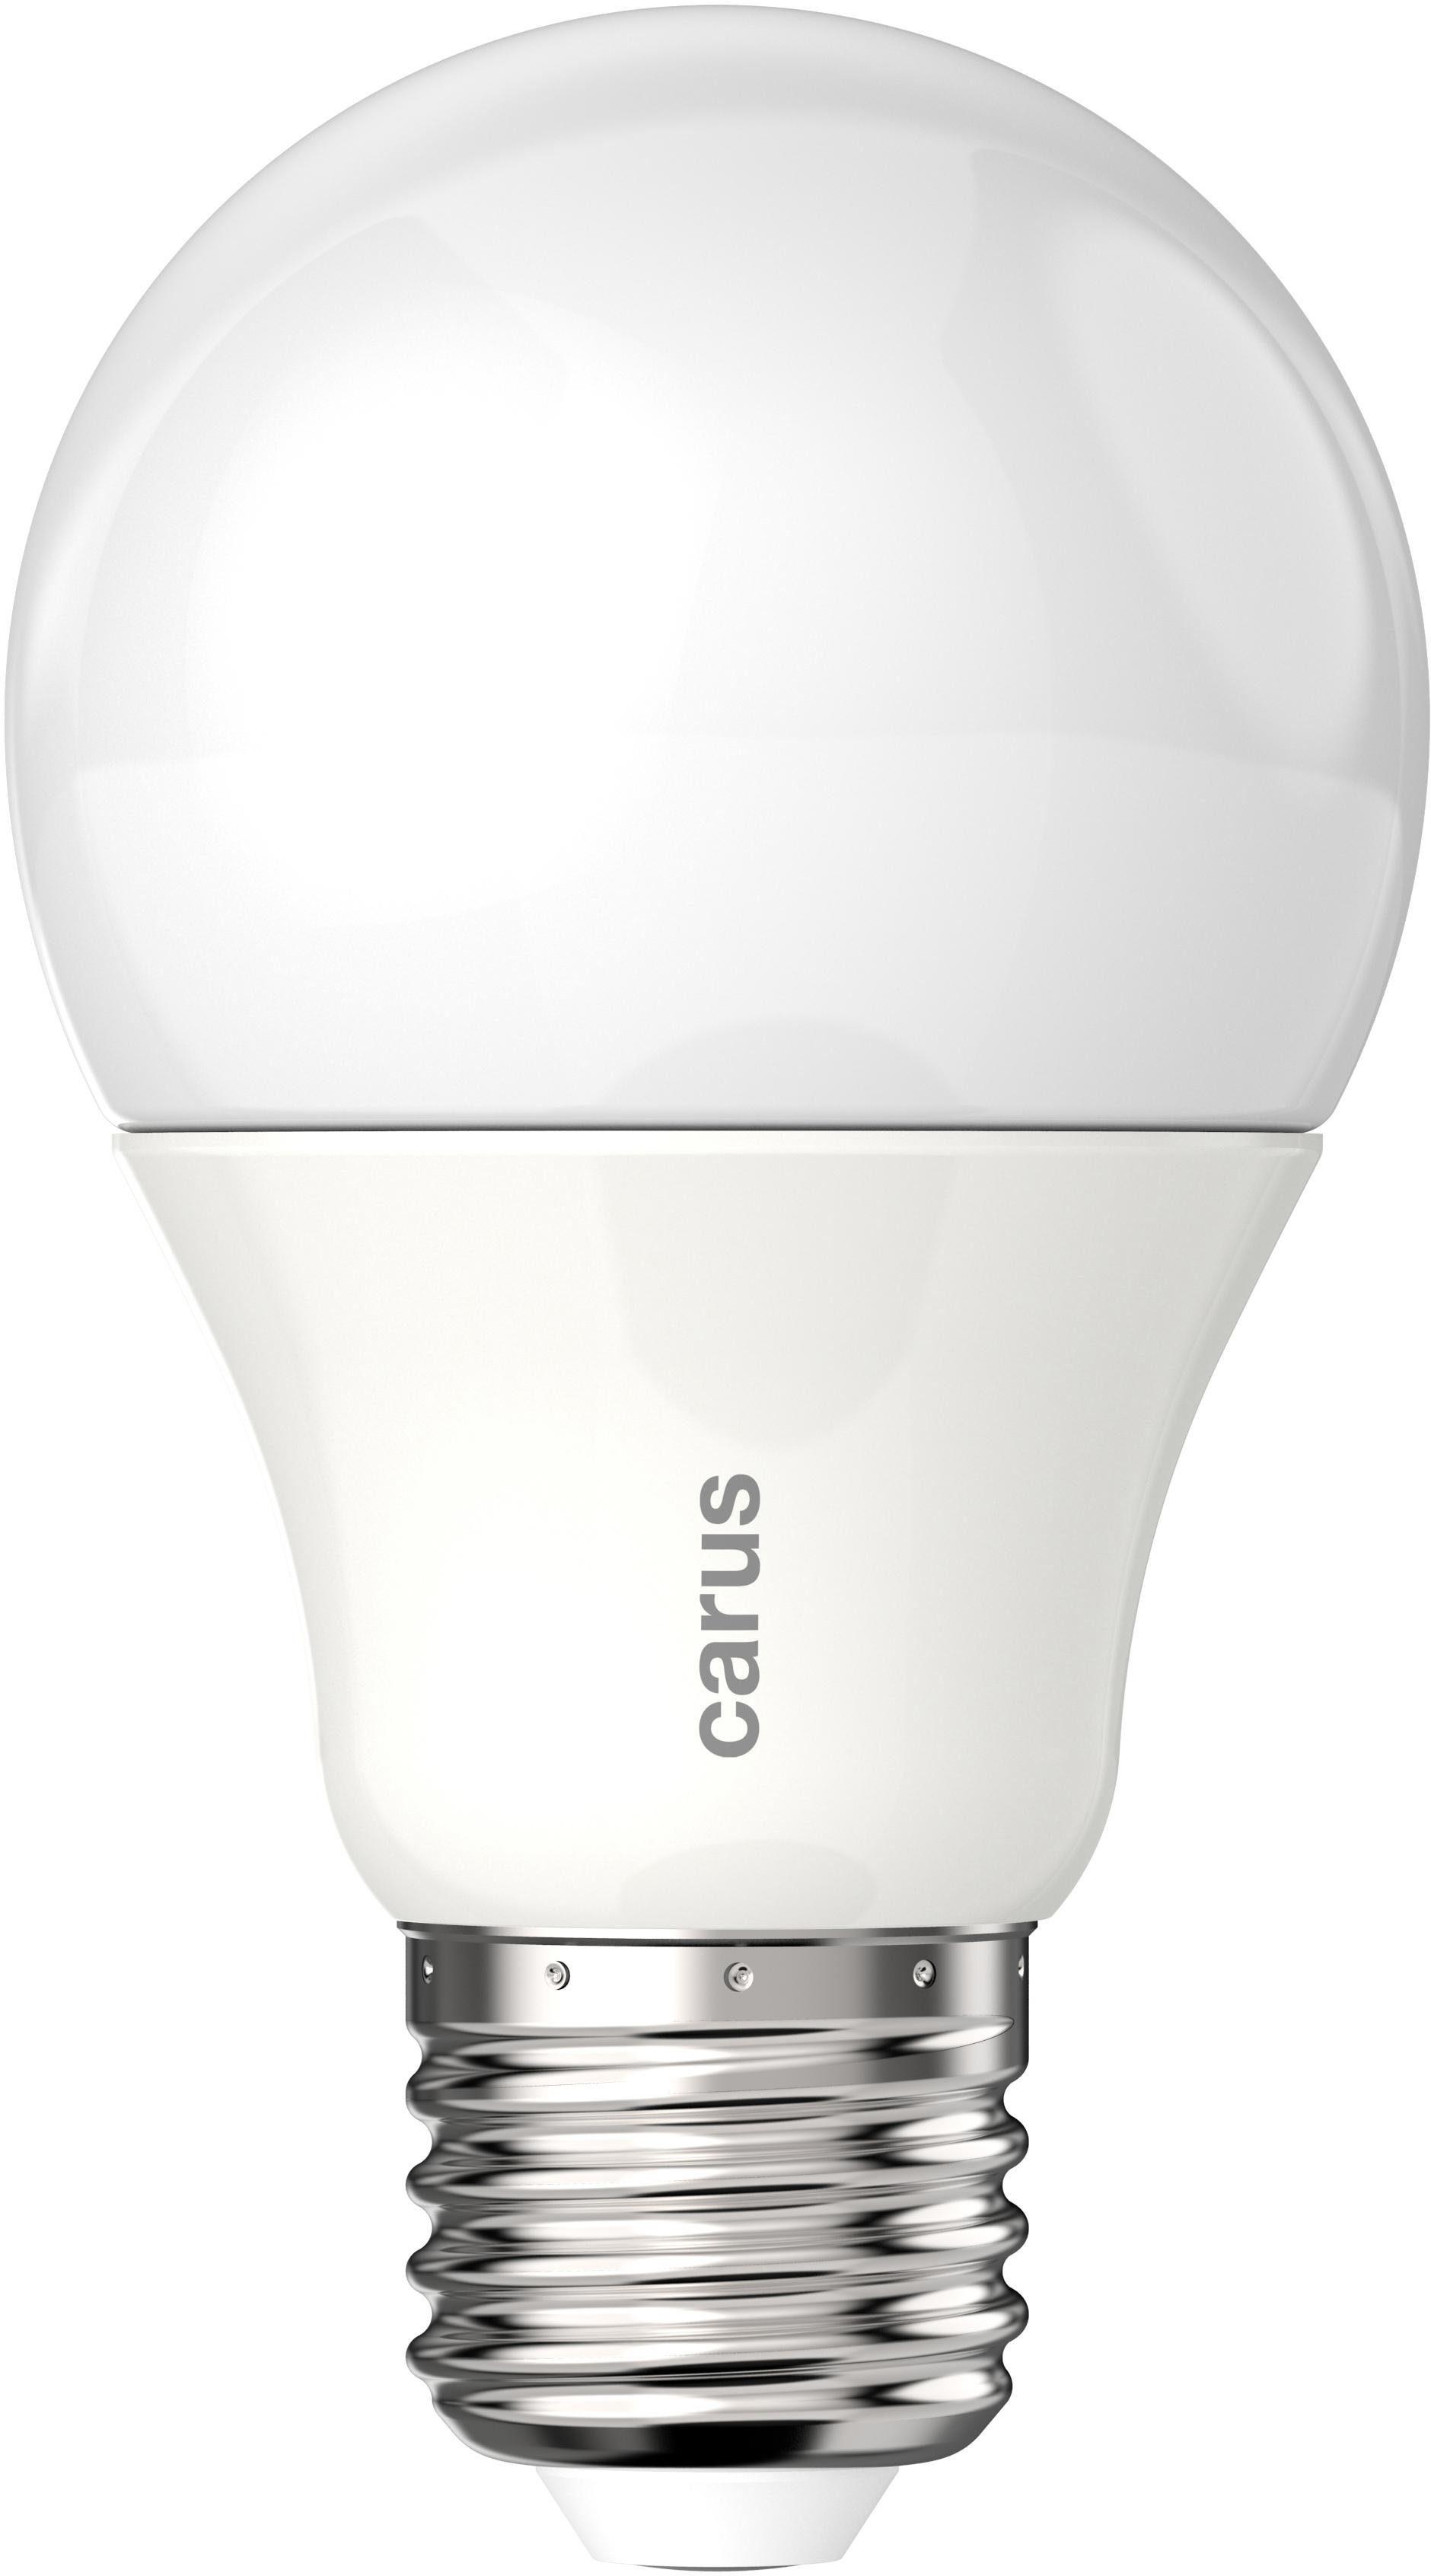 carus »Classic Dim 800« LED-Leuchtmittel, E27, 2 Stück, Warmweiß